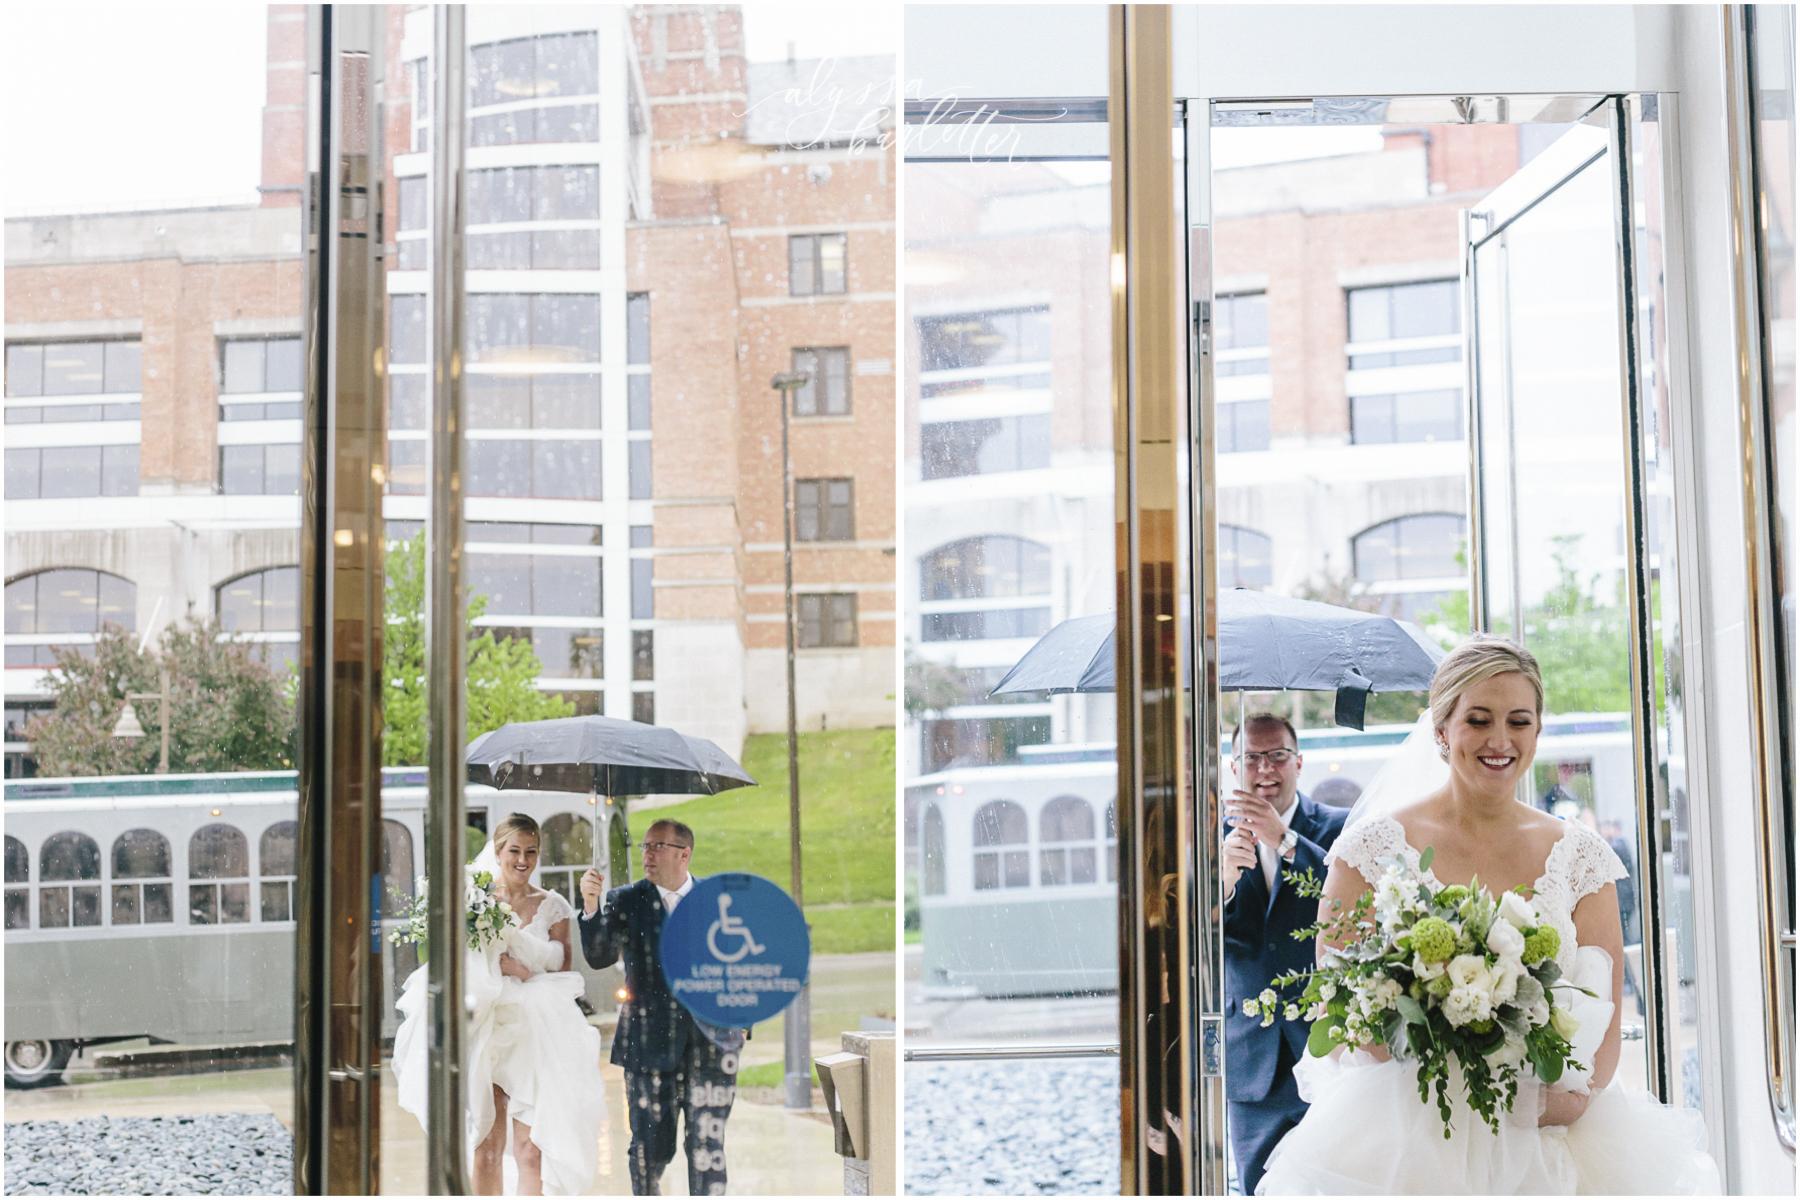 alyssa barletter photography cider gallery lawrence kansas rainy day wedding megan and brett-1-17.jpg